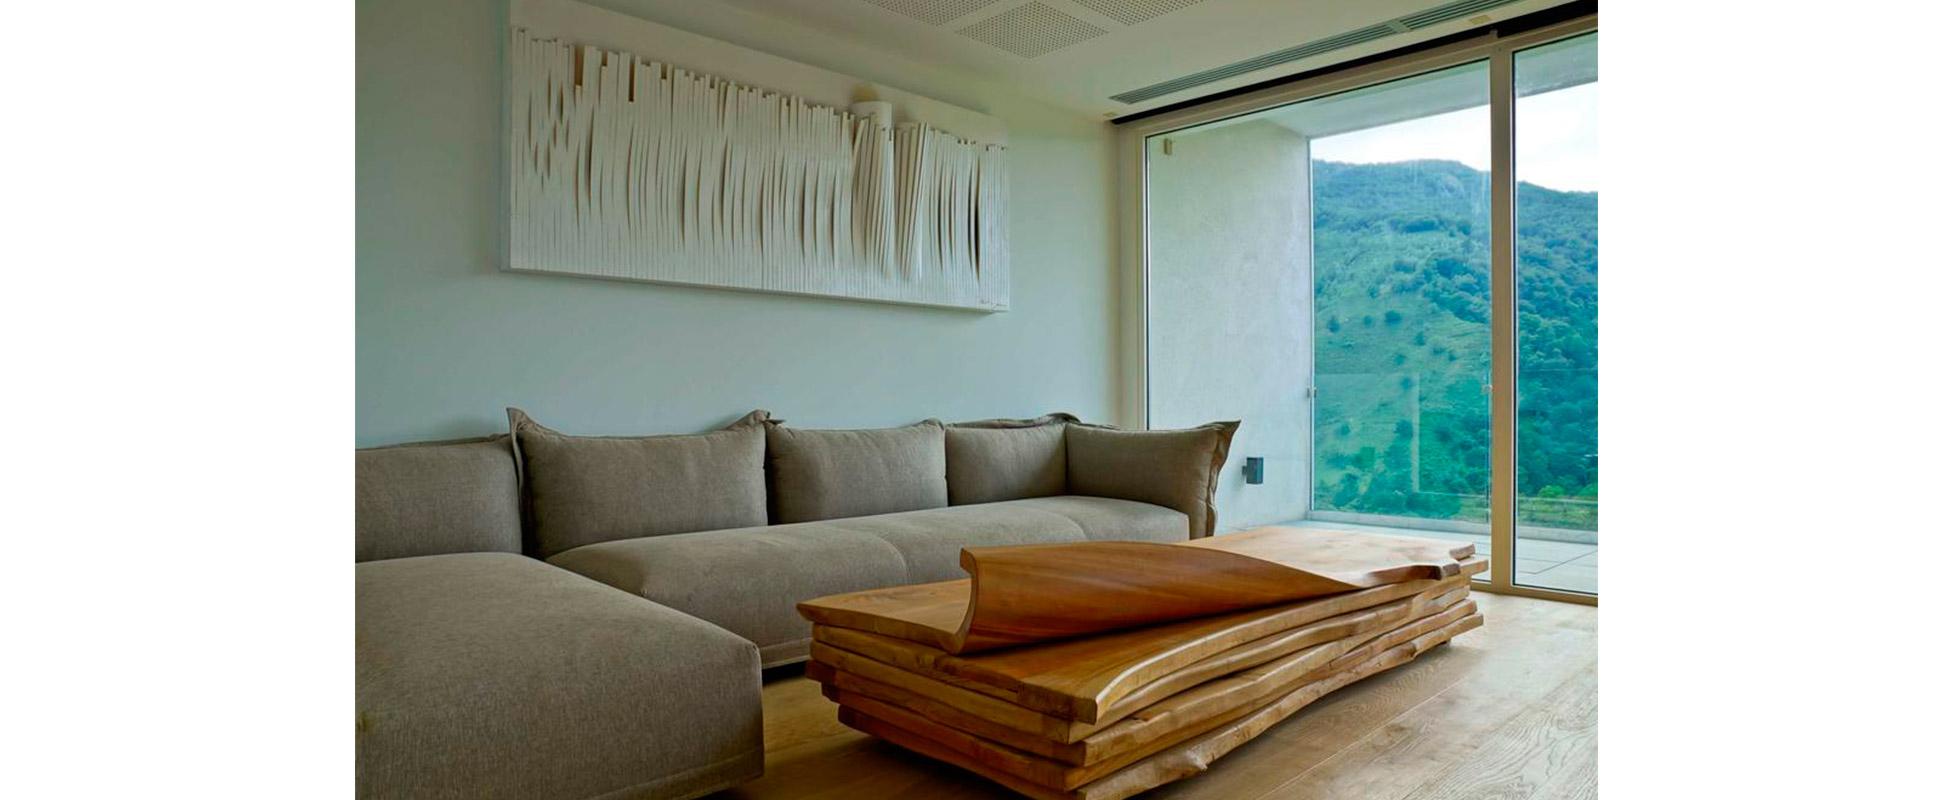 Proyectos_hotel_arantza_02